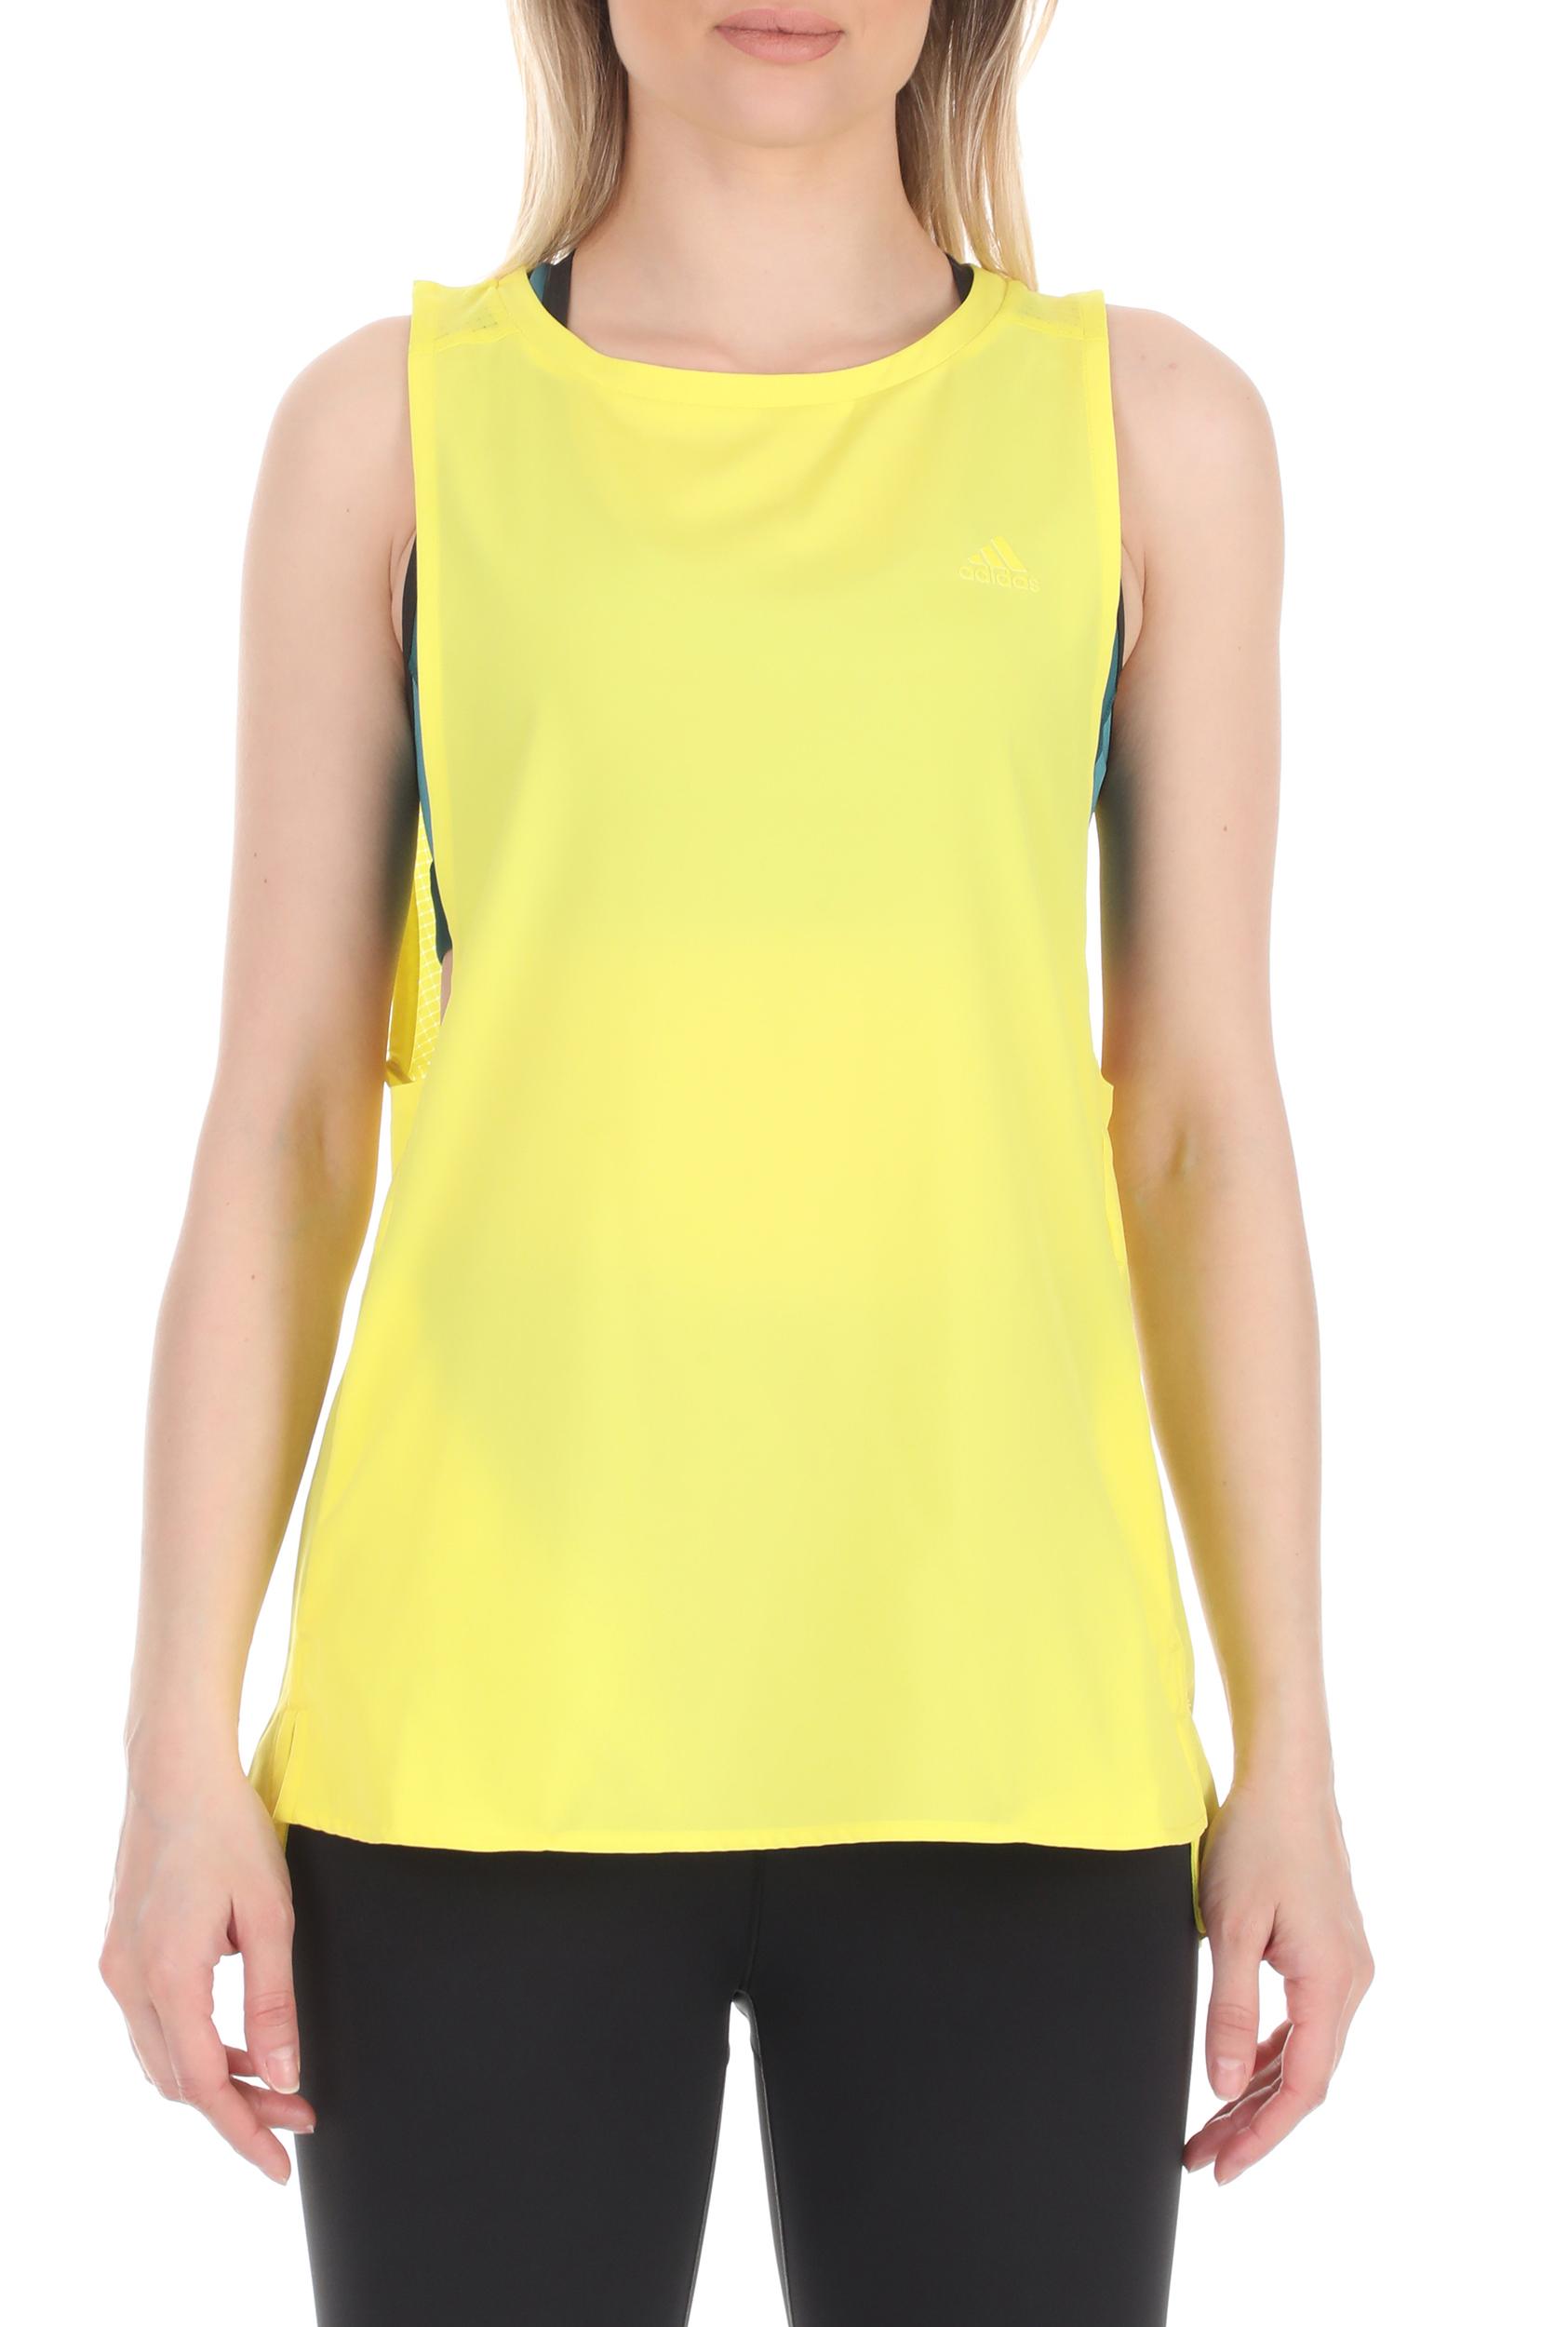 adidas Performance - Γυναικεία αθλητική μπλούζα adidas Performance κίτρινη